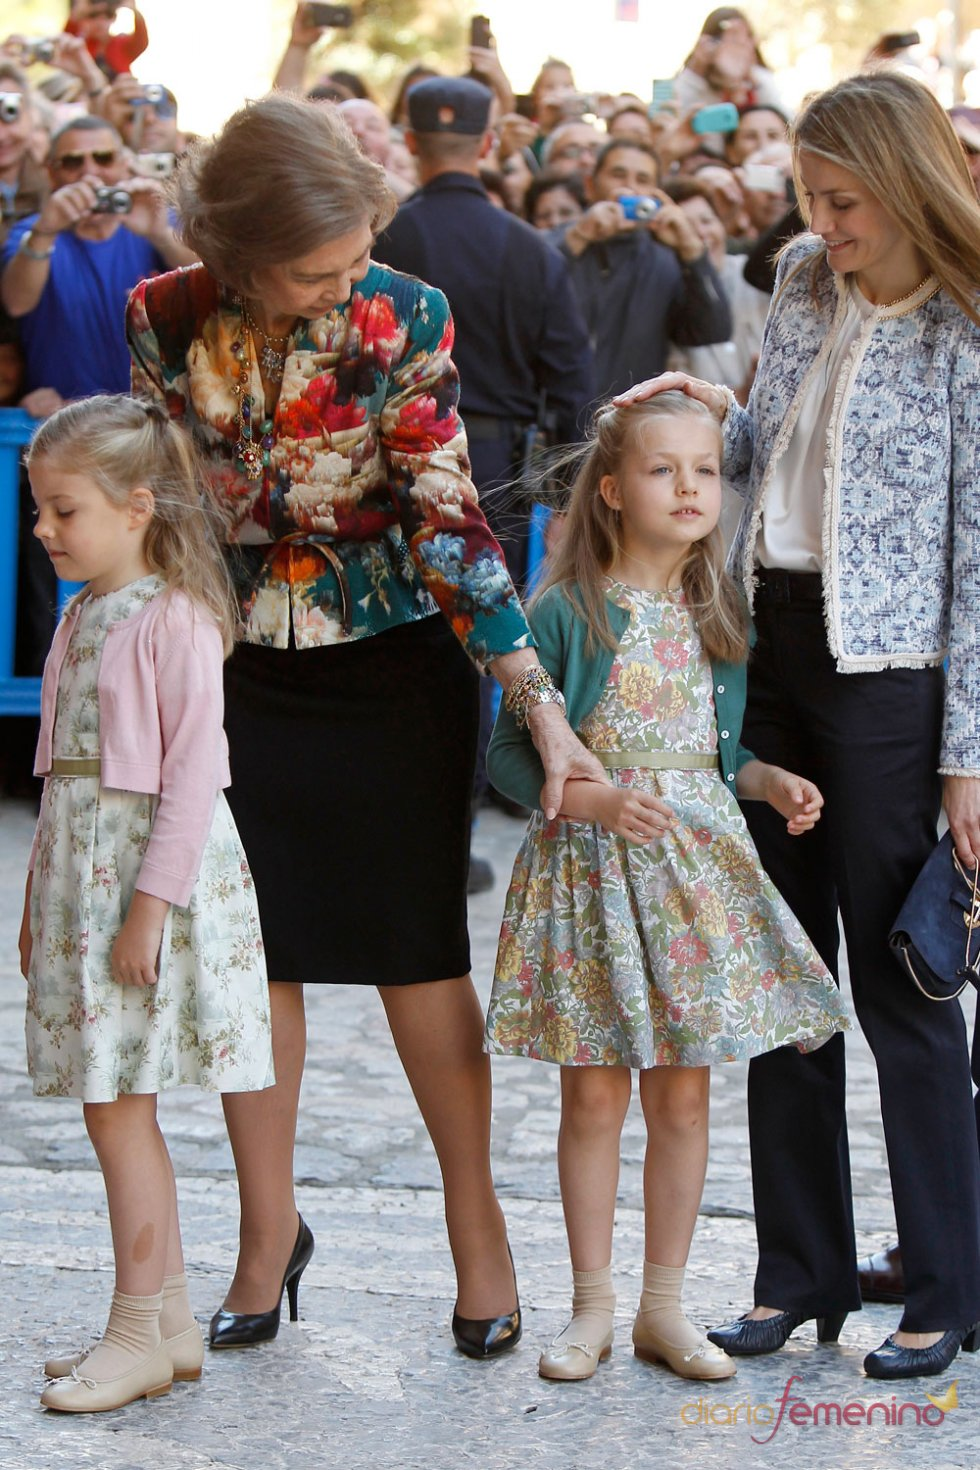 La Reina Sofía con la Infanta Leonor, en la Pascua de Semana Santa 2013